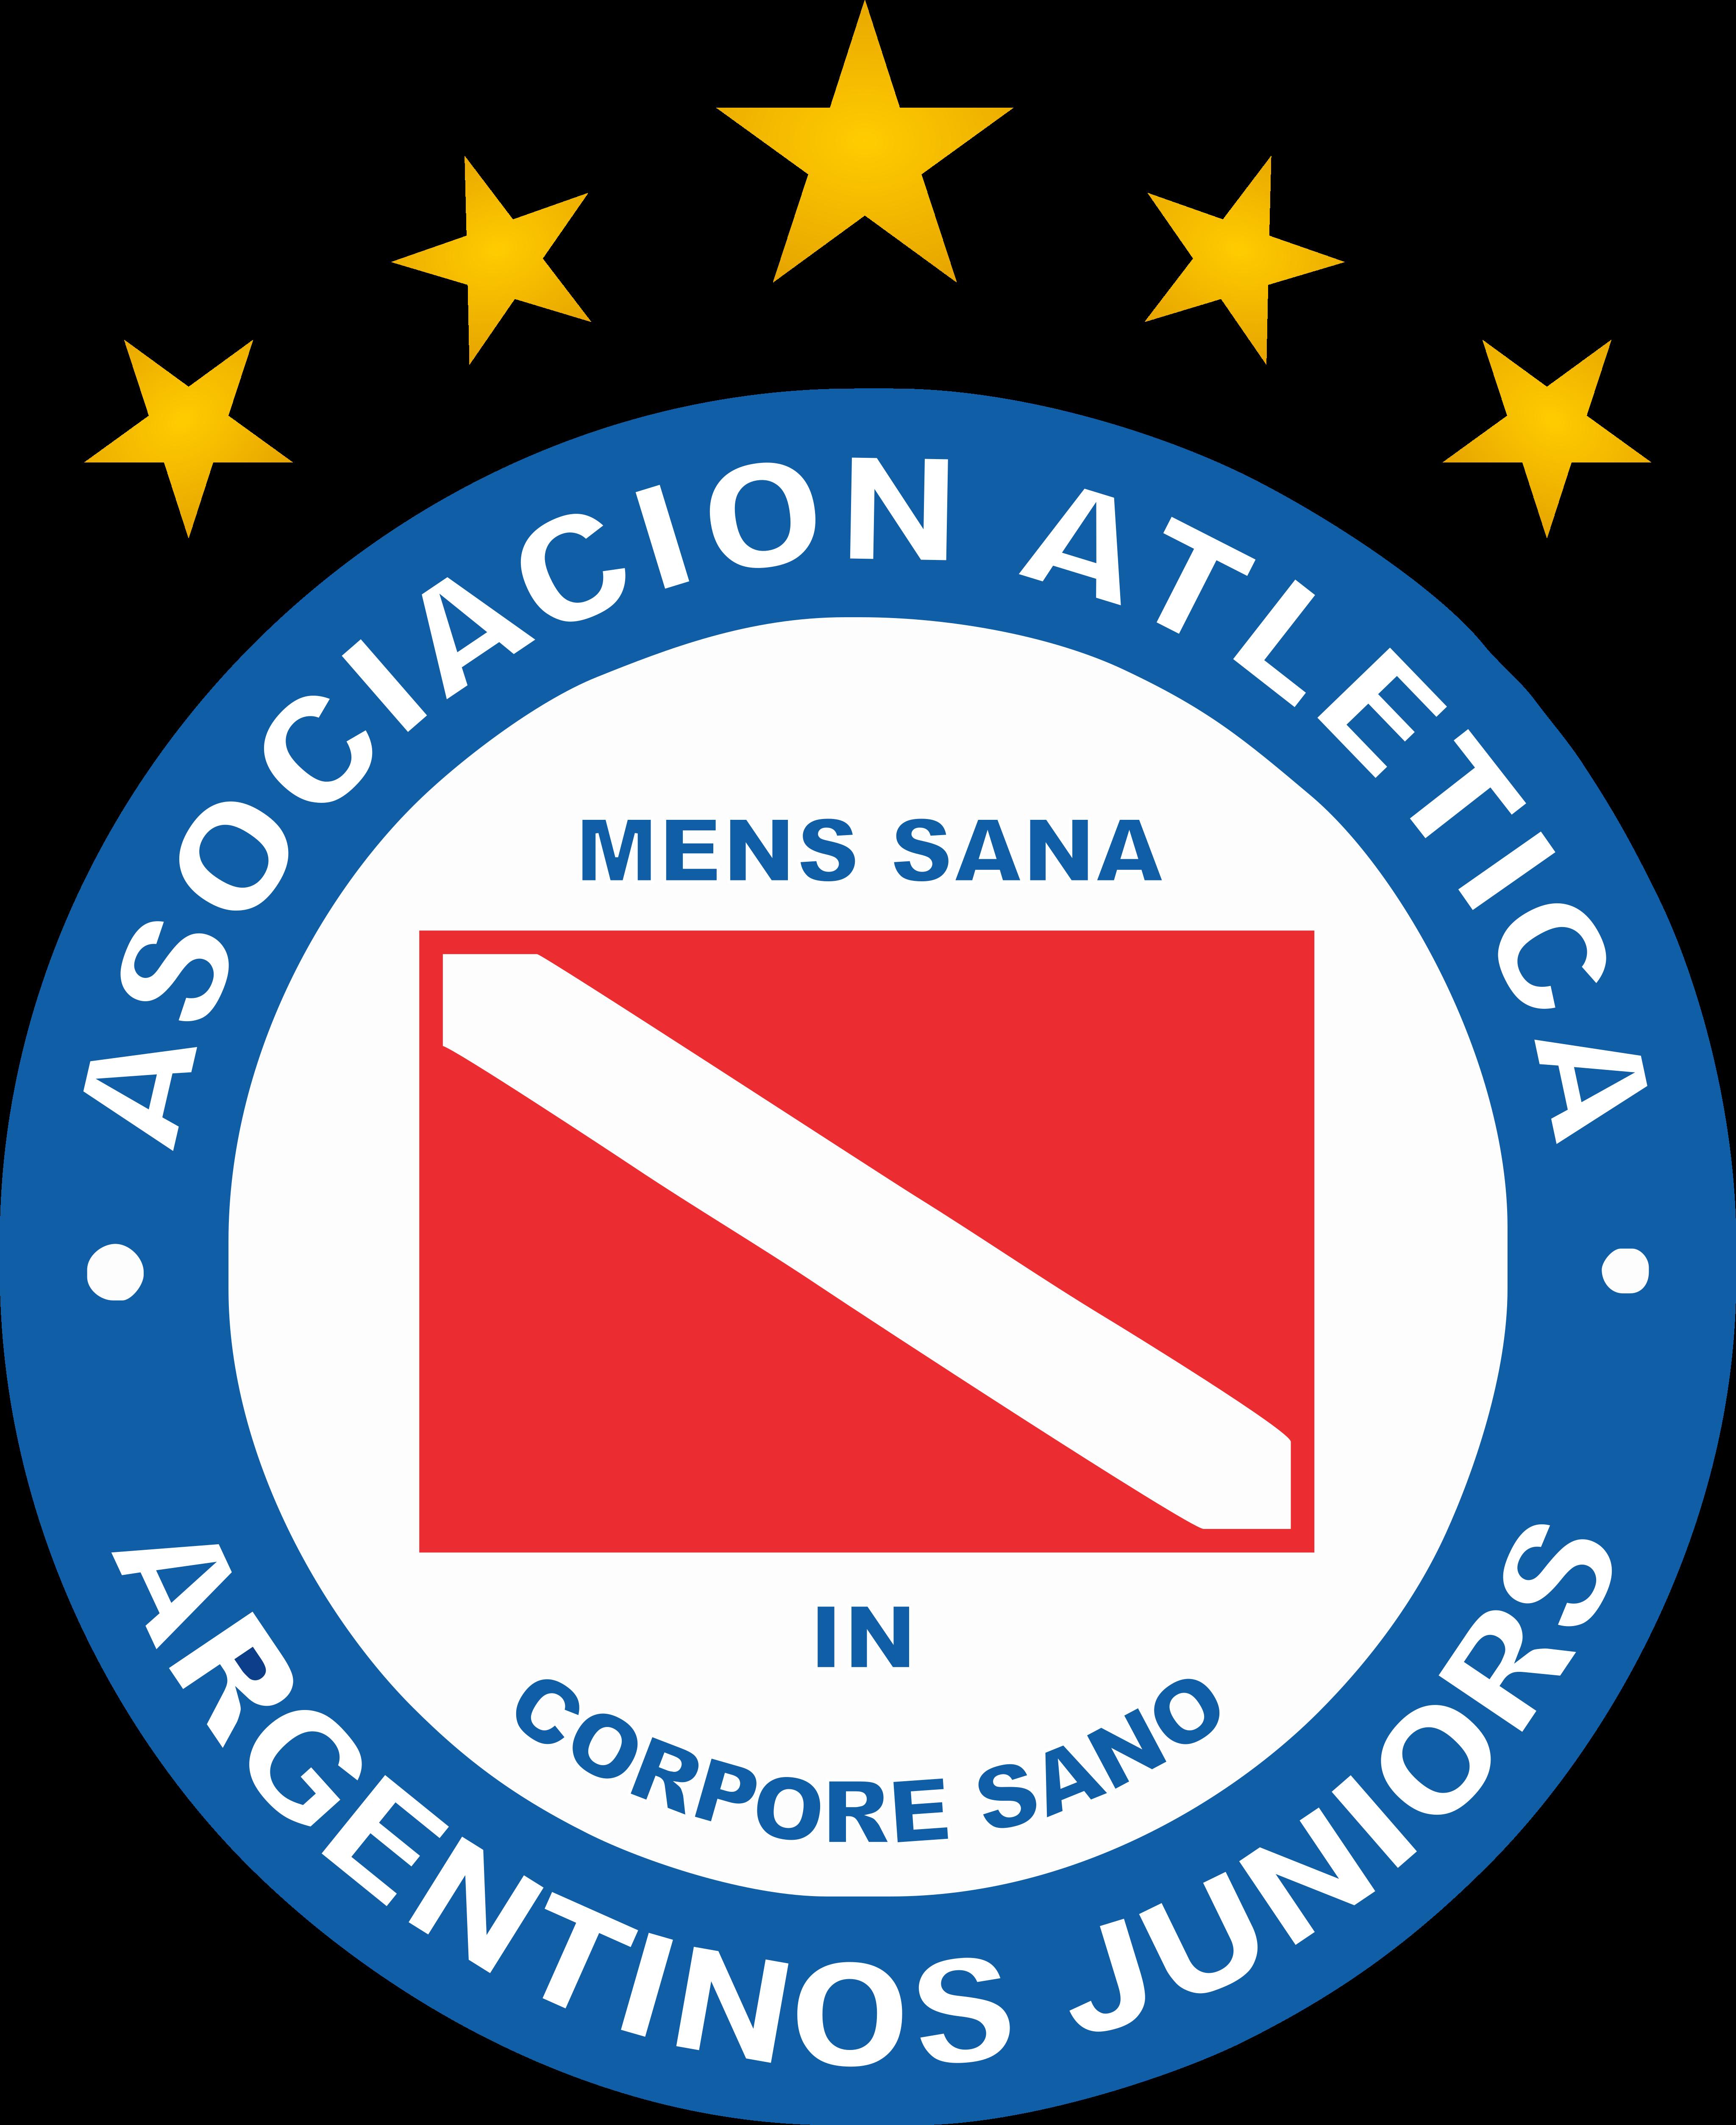 argentinos juniors logo 1 - Argentinos Juniors Logo